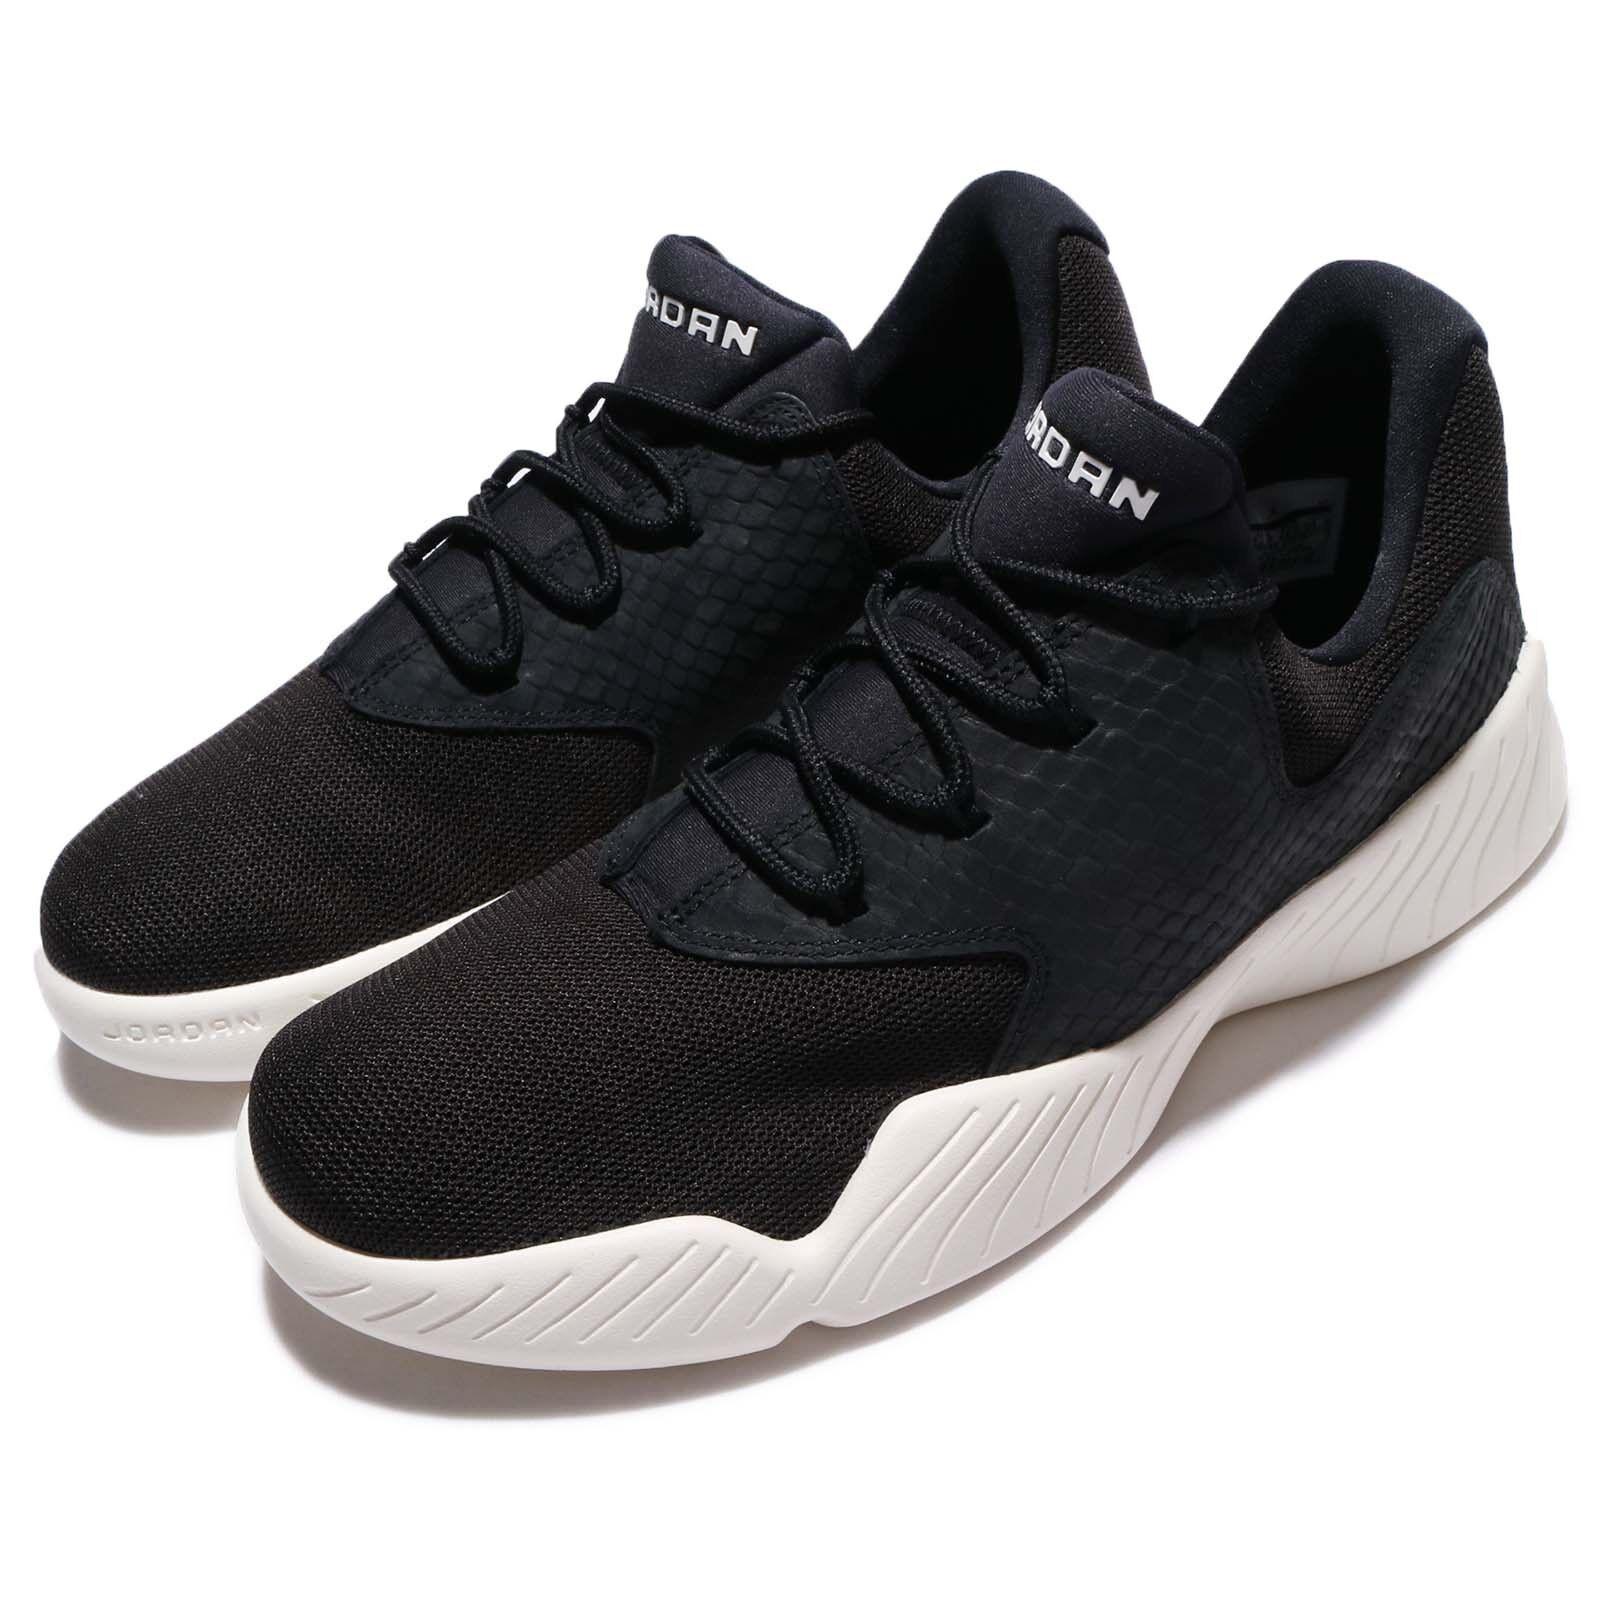 Nike Jordan J23 faible noir blanc homme Casual chaussures Sneakers Slip-On 905288-011